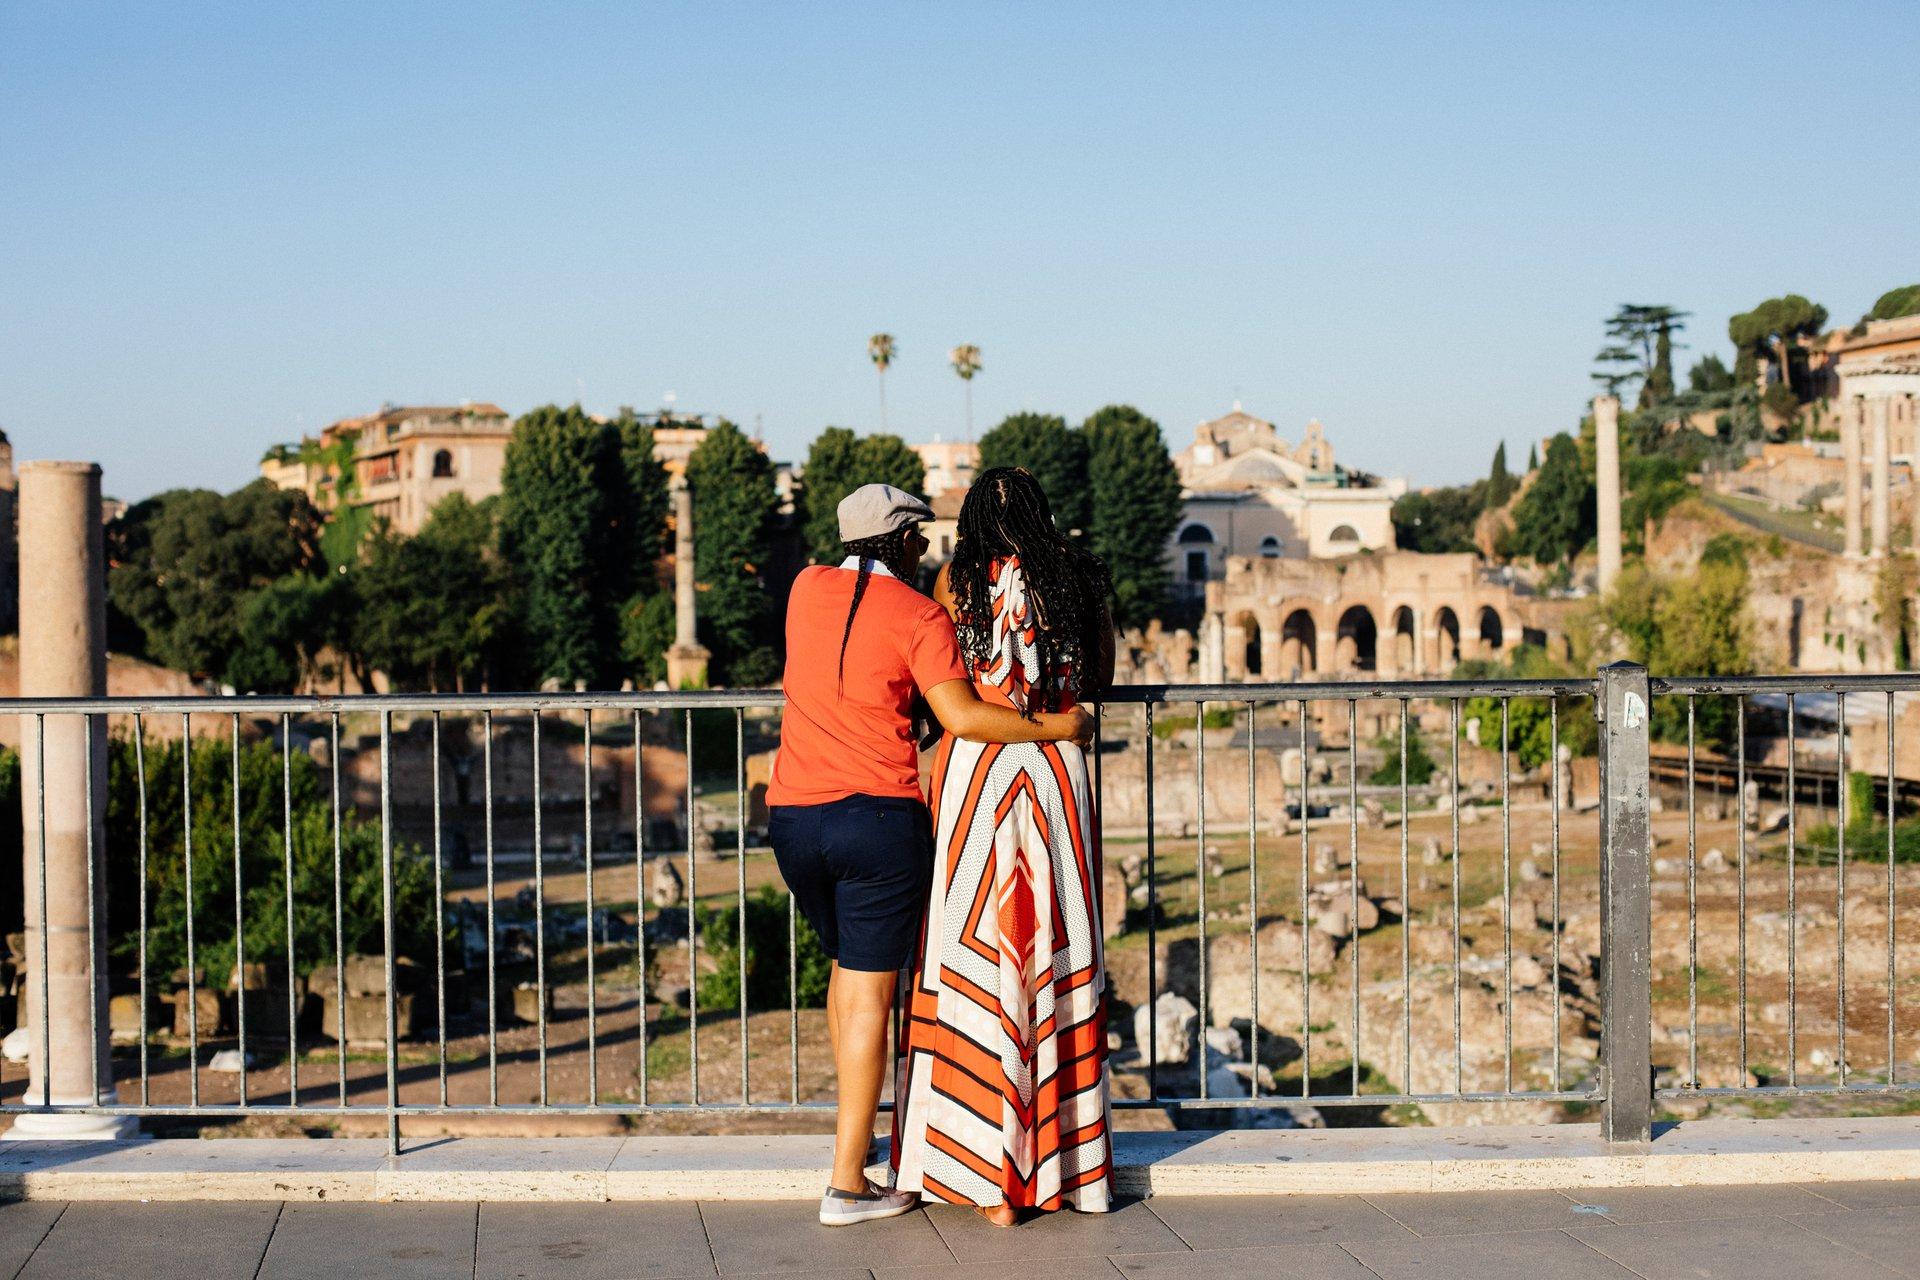 Rome-Italy-travel-story-Flytographer-12